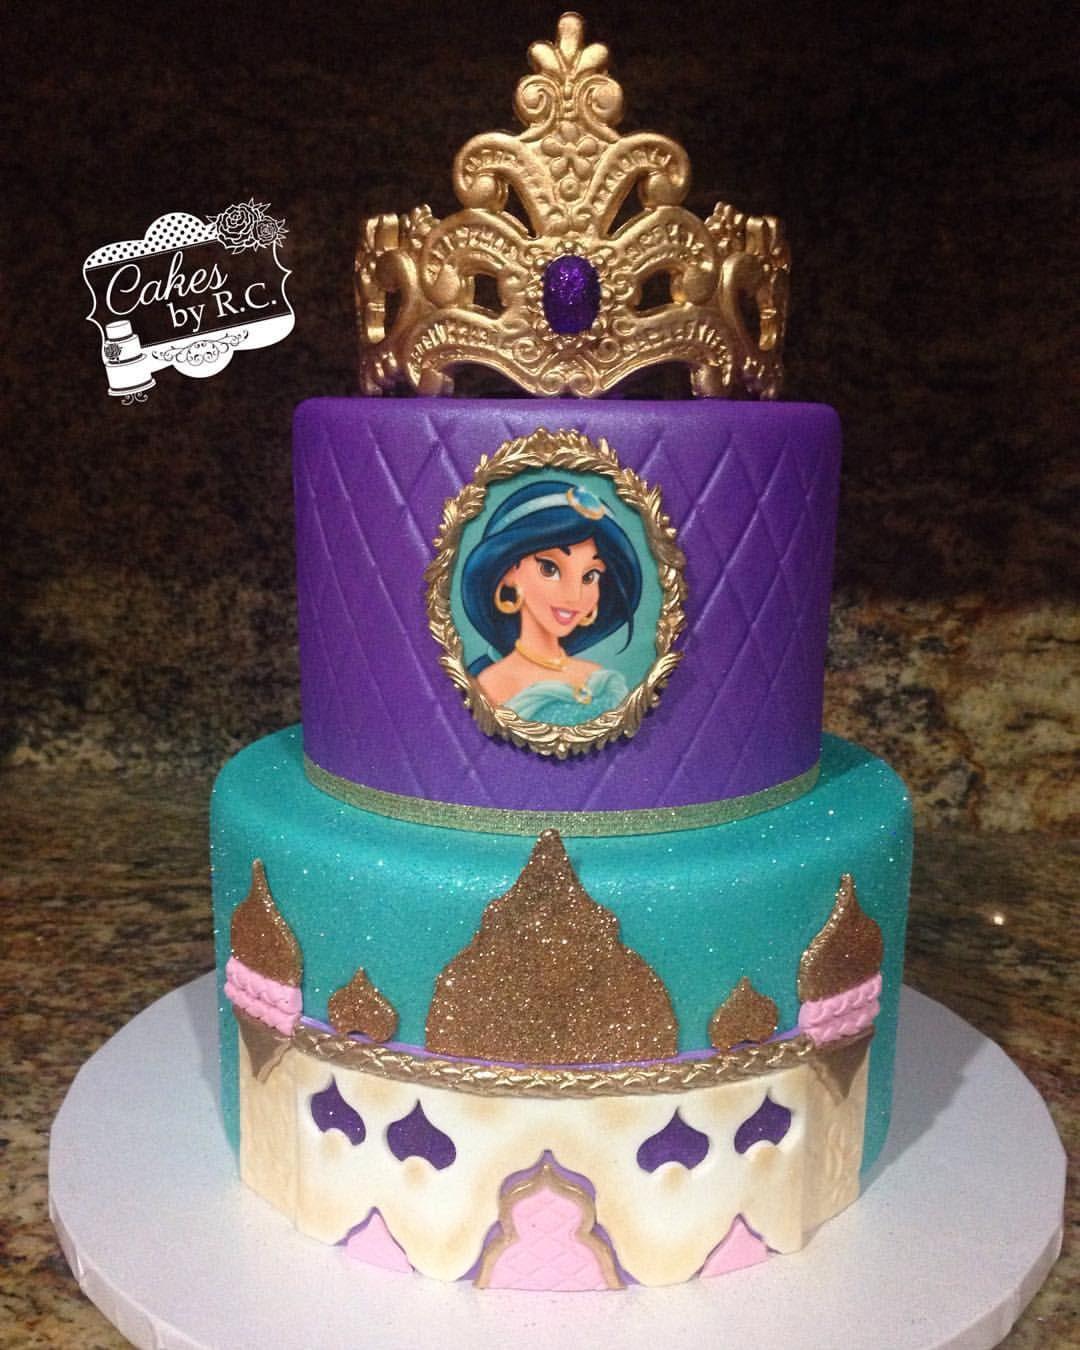 Magnificent 32 Amazing Photo Of Princess Jasmine Birthday Cake Birijus Com Funny Birthday Cards Online Bapapcheapnameinfo